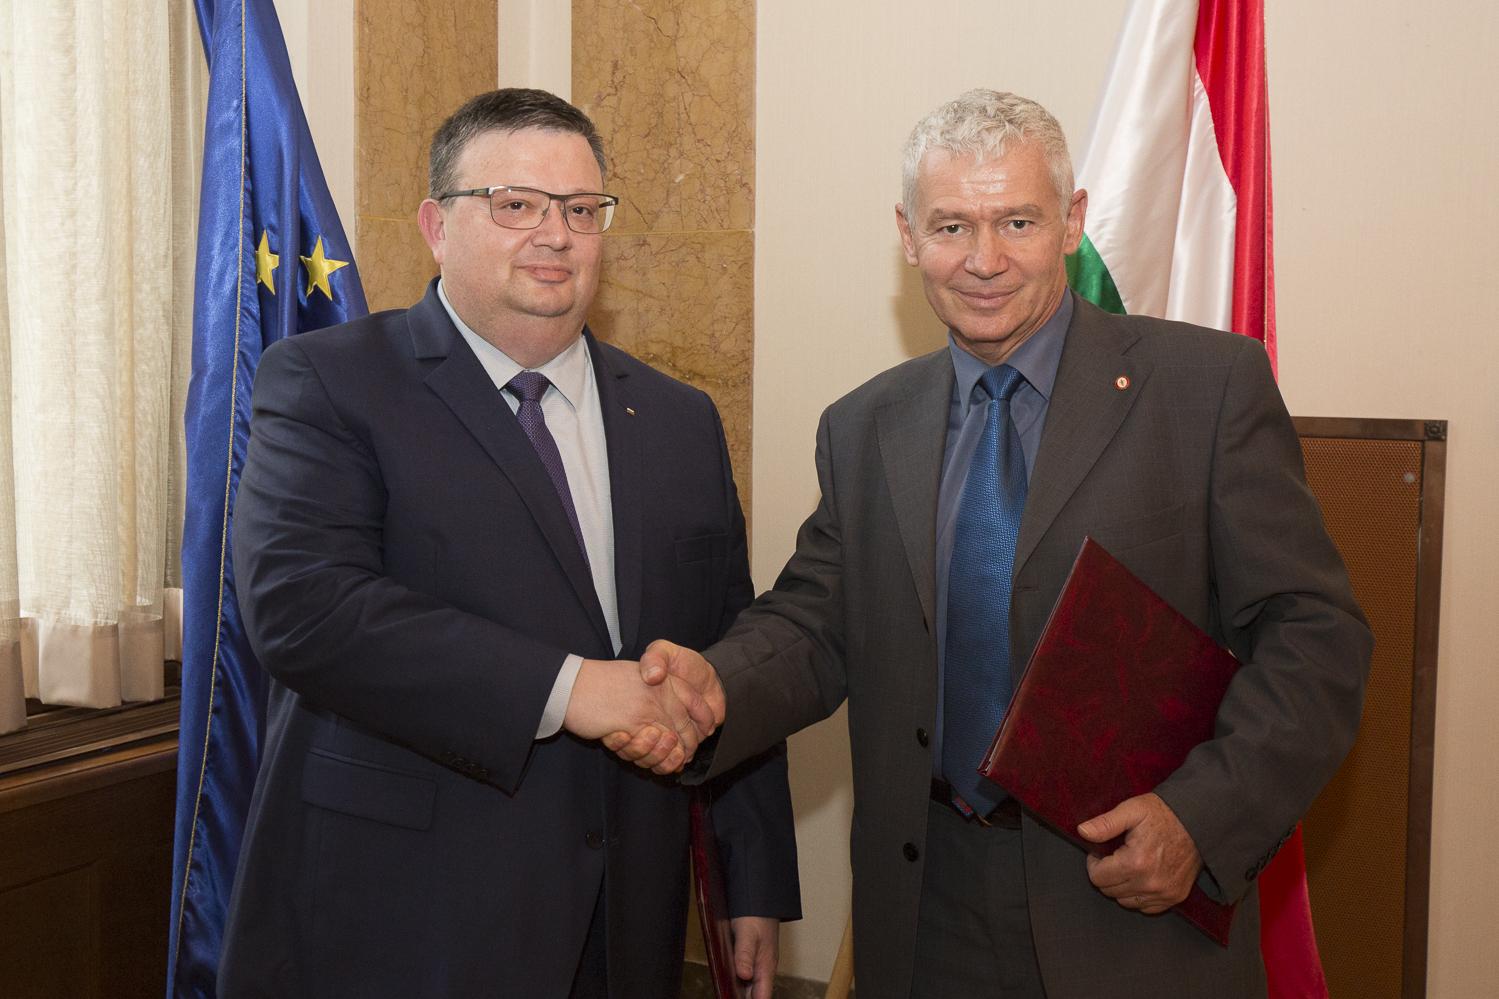 Снимка: ПРБГлавният прокурор Сотир Цацаров и унгарският му колега Петер